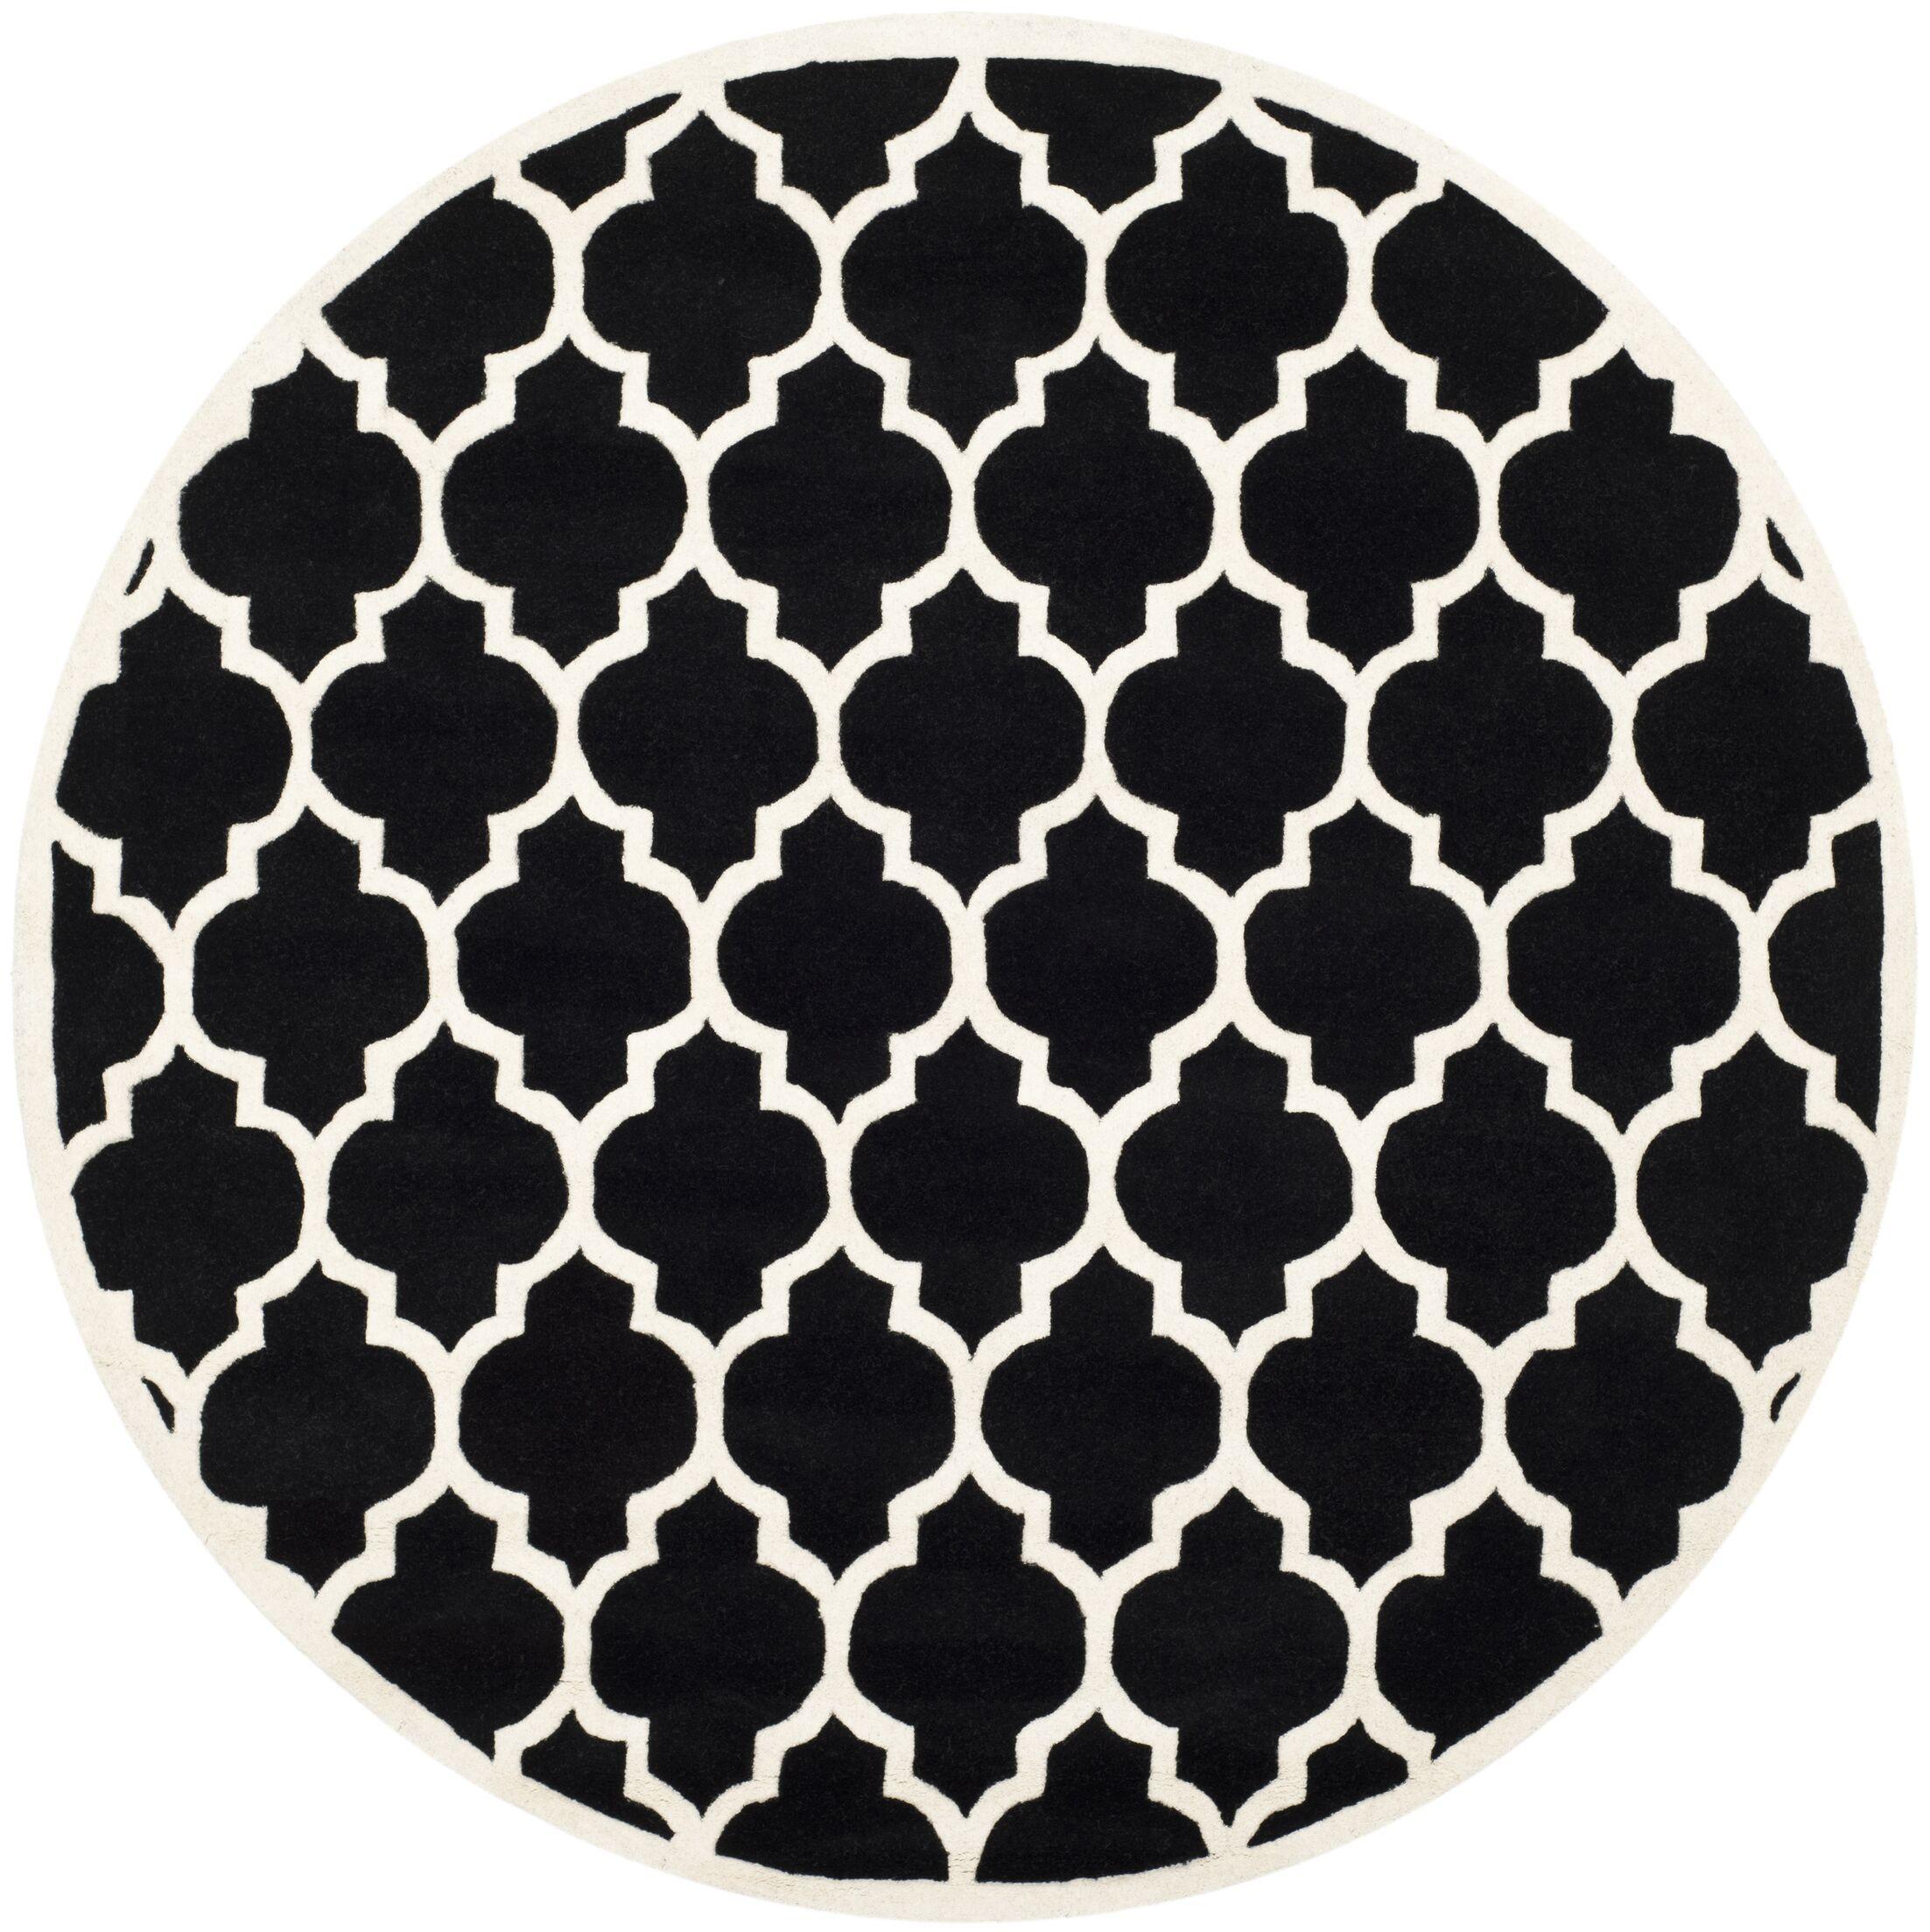 Wilkin Hand-Tufted Black/Ivory Area Rug Rug Size: Round 7'